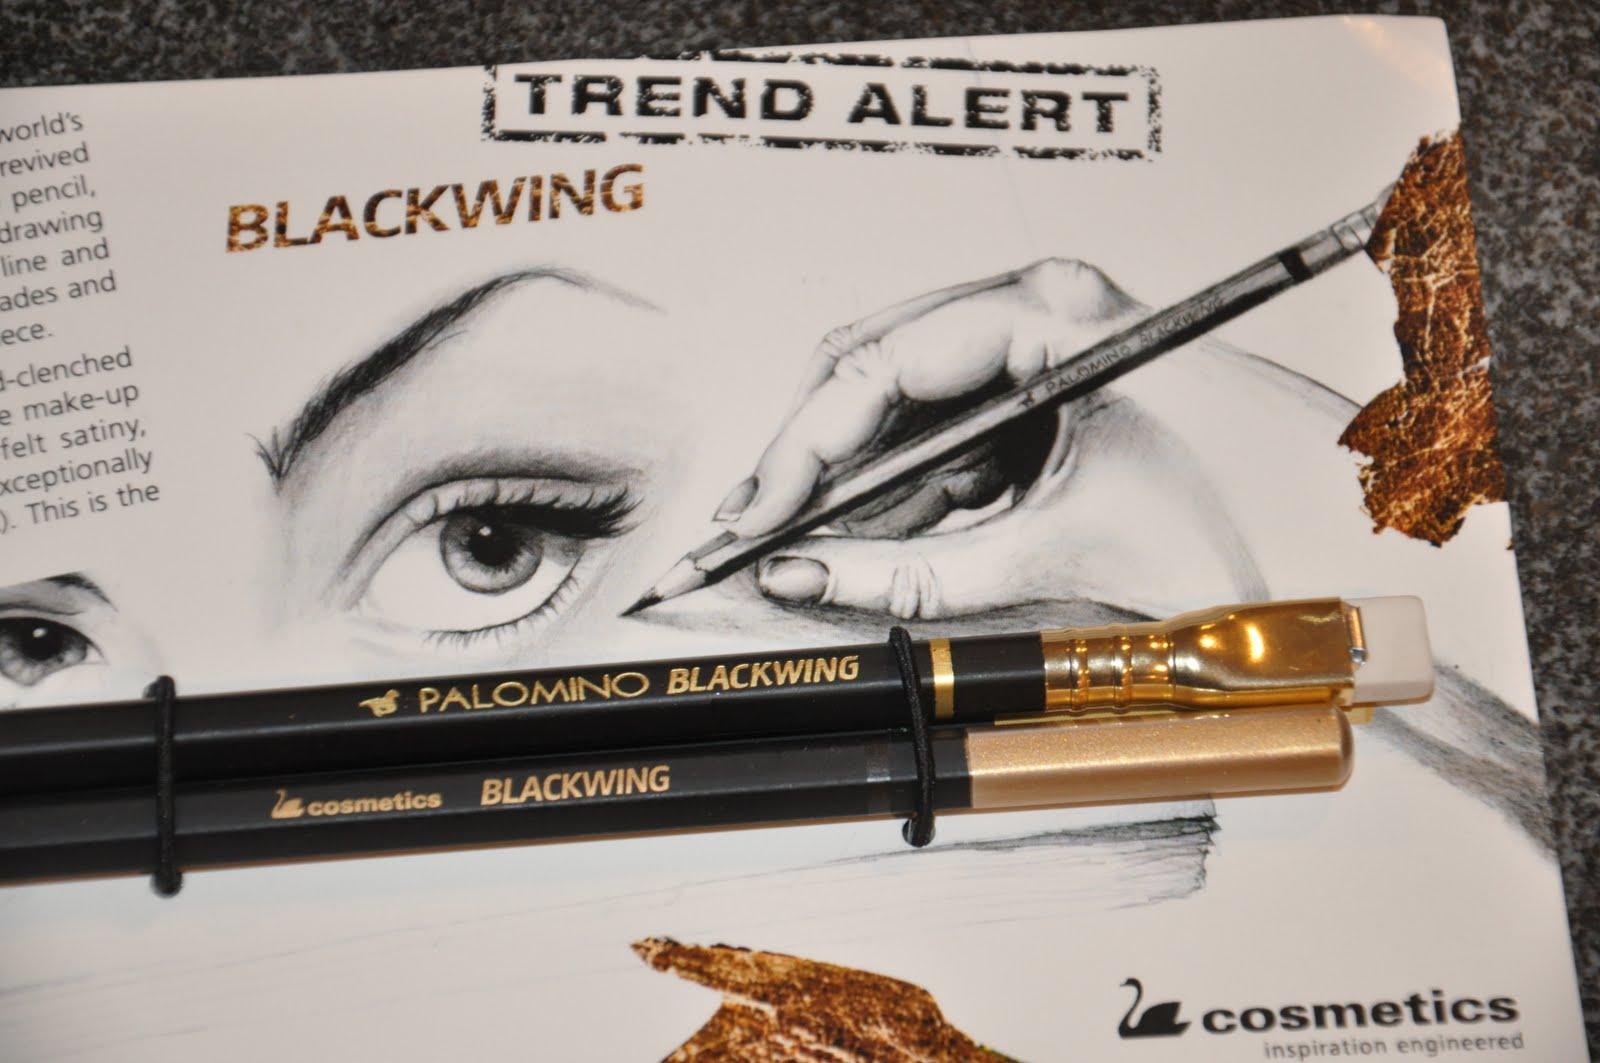 Palomino Blackwing Setting Design Trends – CalCedar